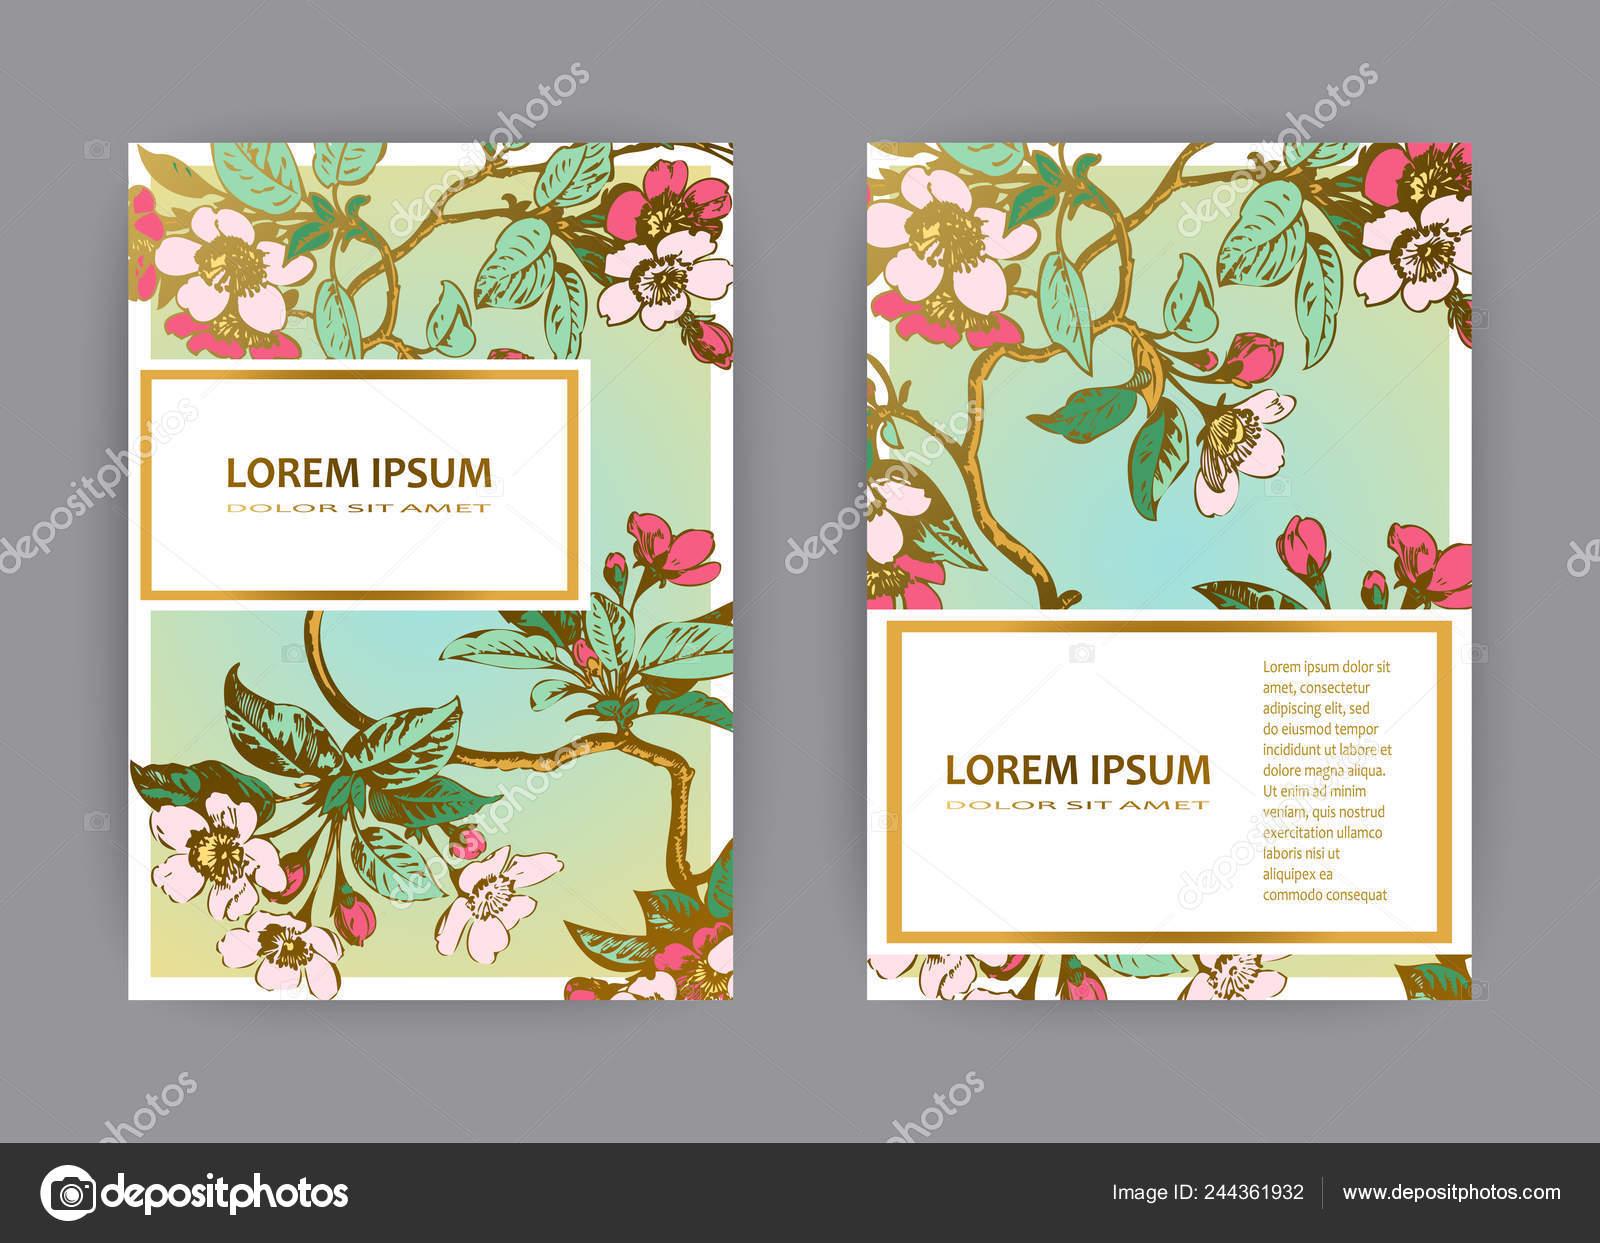 Diseño Plantillas Tarjeta Invitación Boda Botánico Dibujado